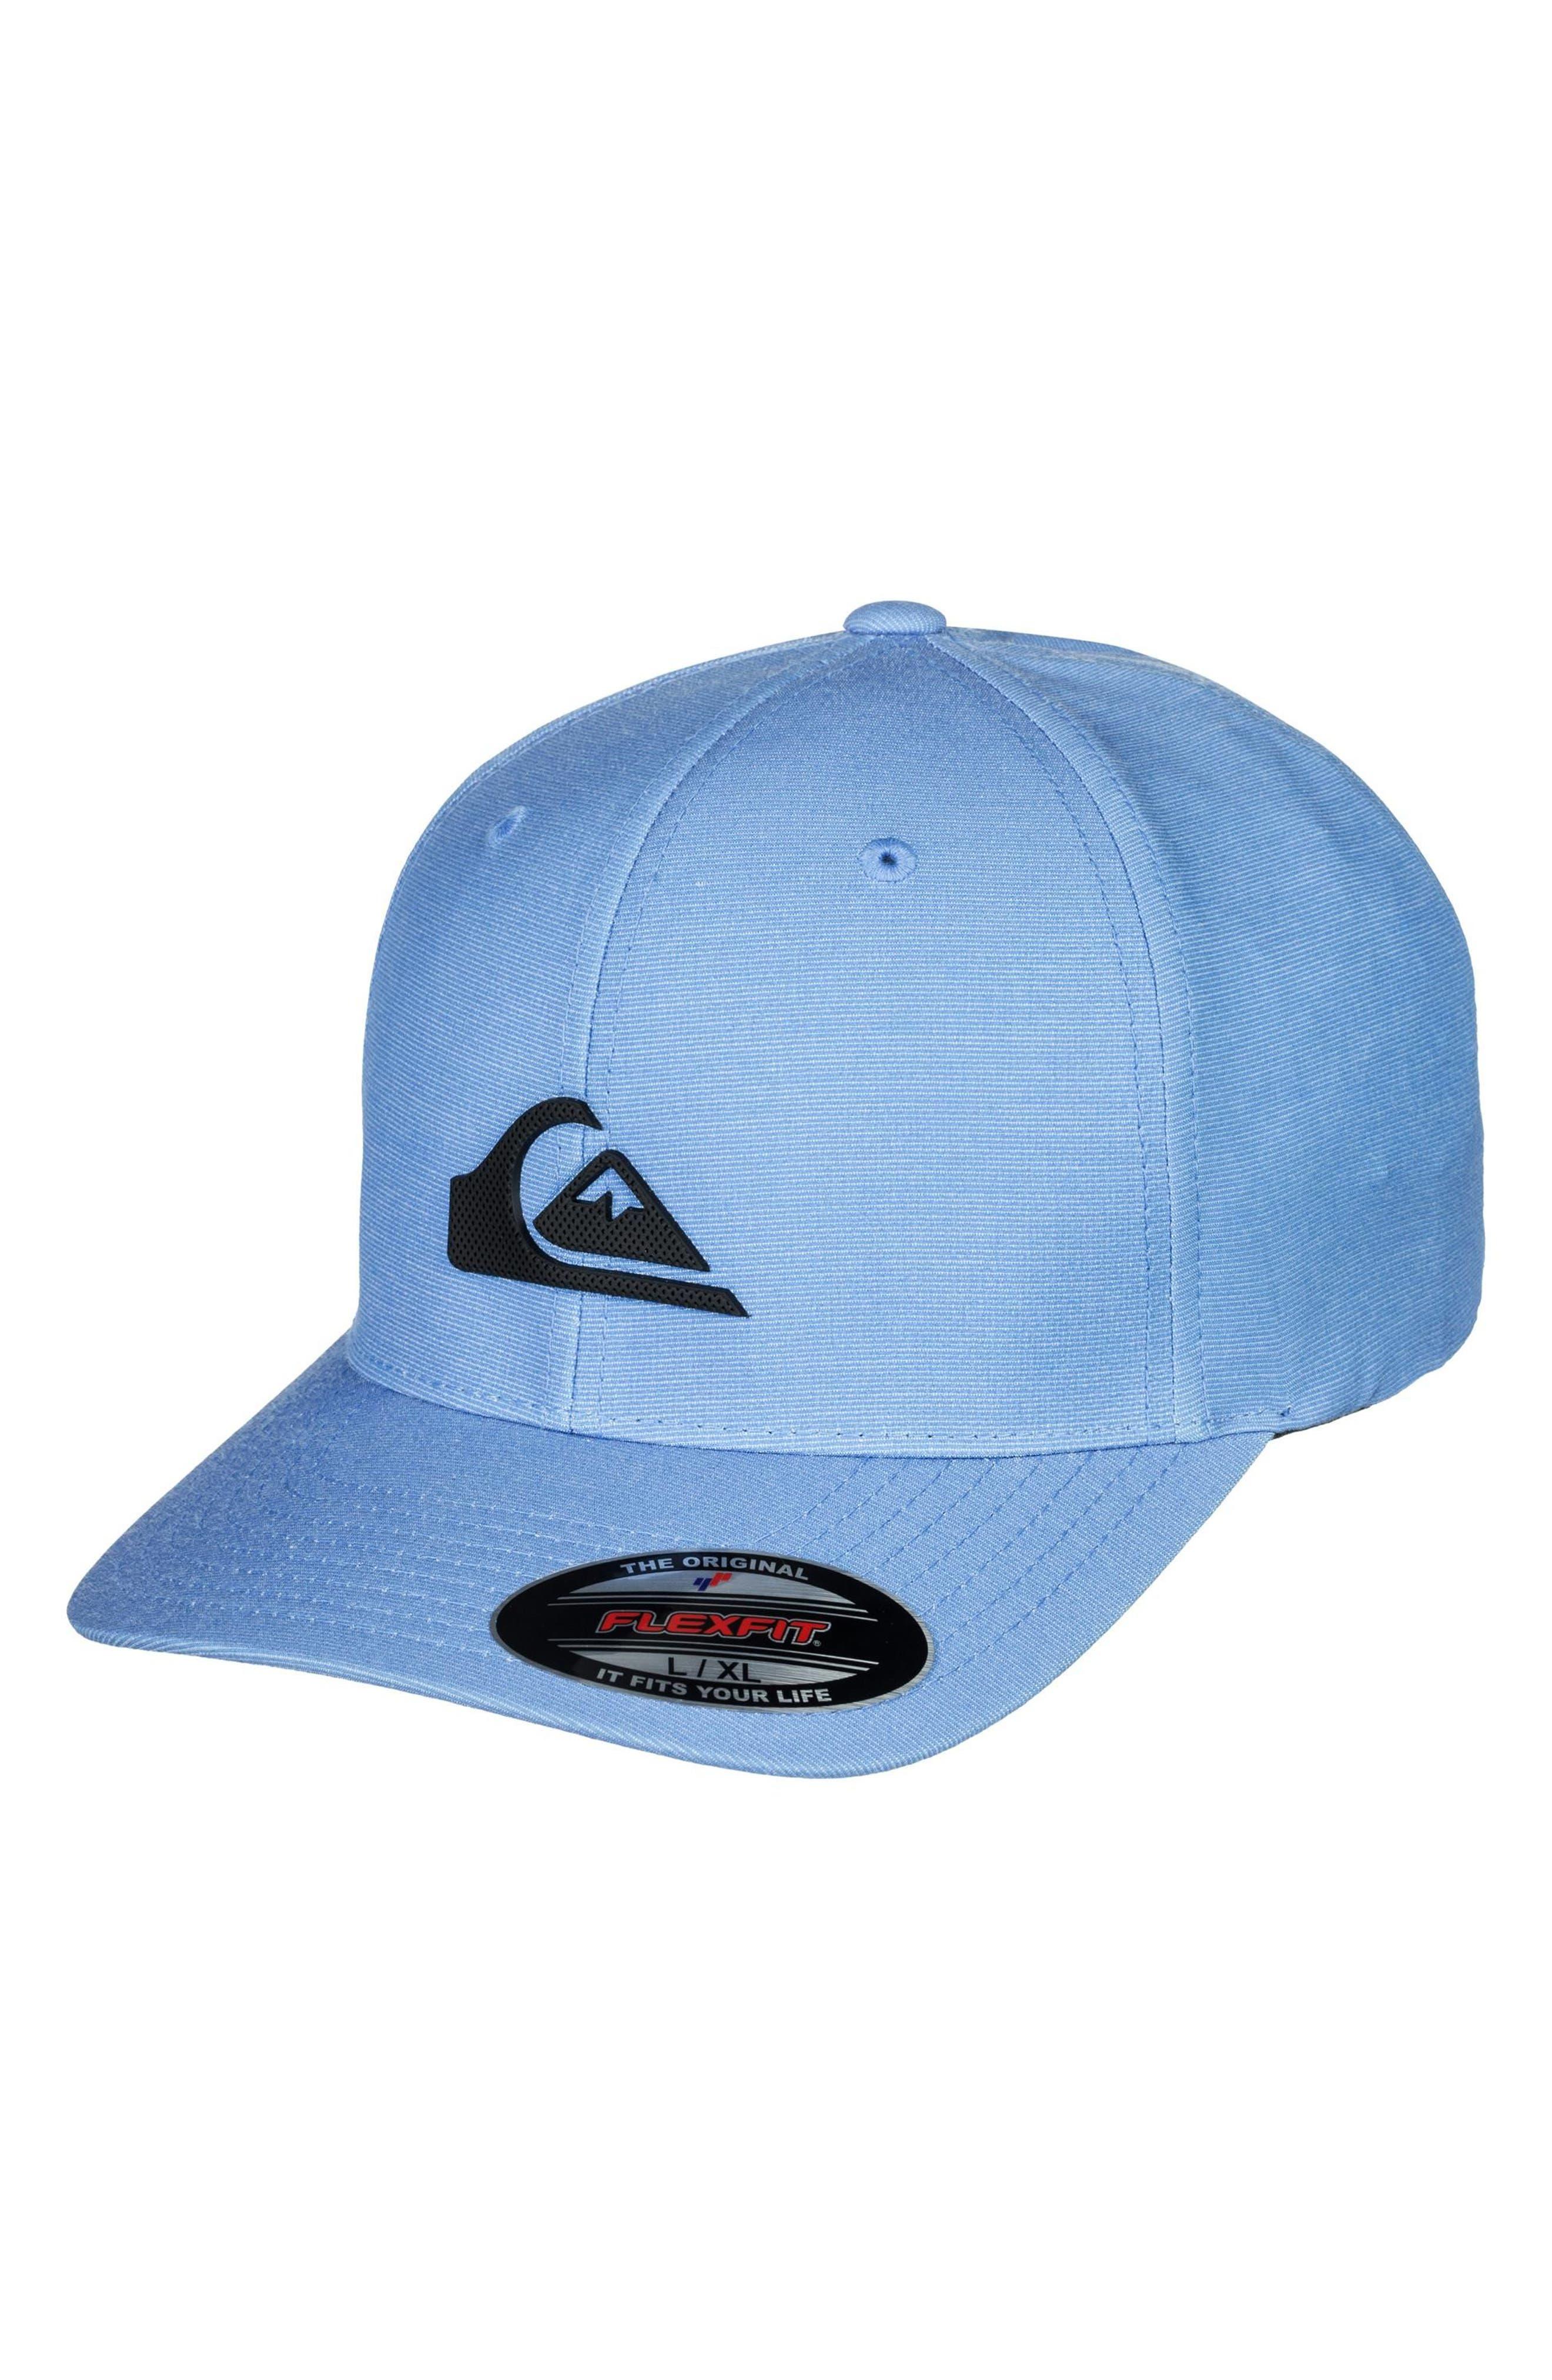 Texturizer Flexfit Ball Cap,                             Main thumbnail 1, color,                             Silver Lake Blue